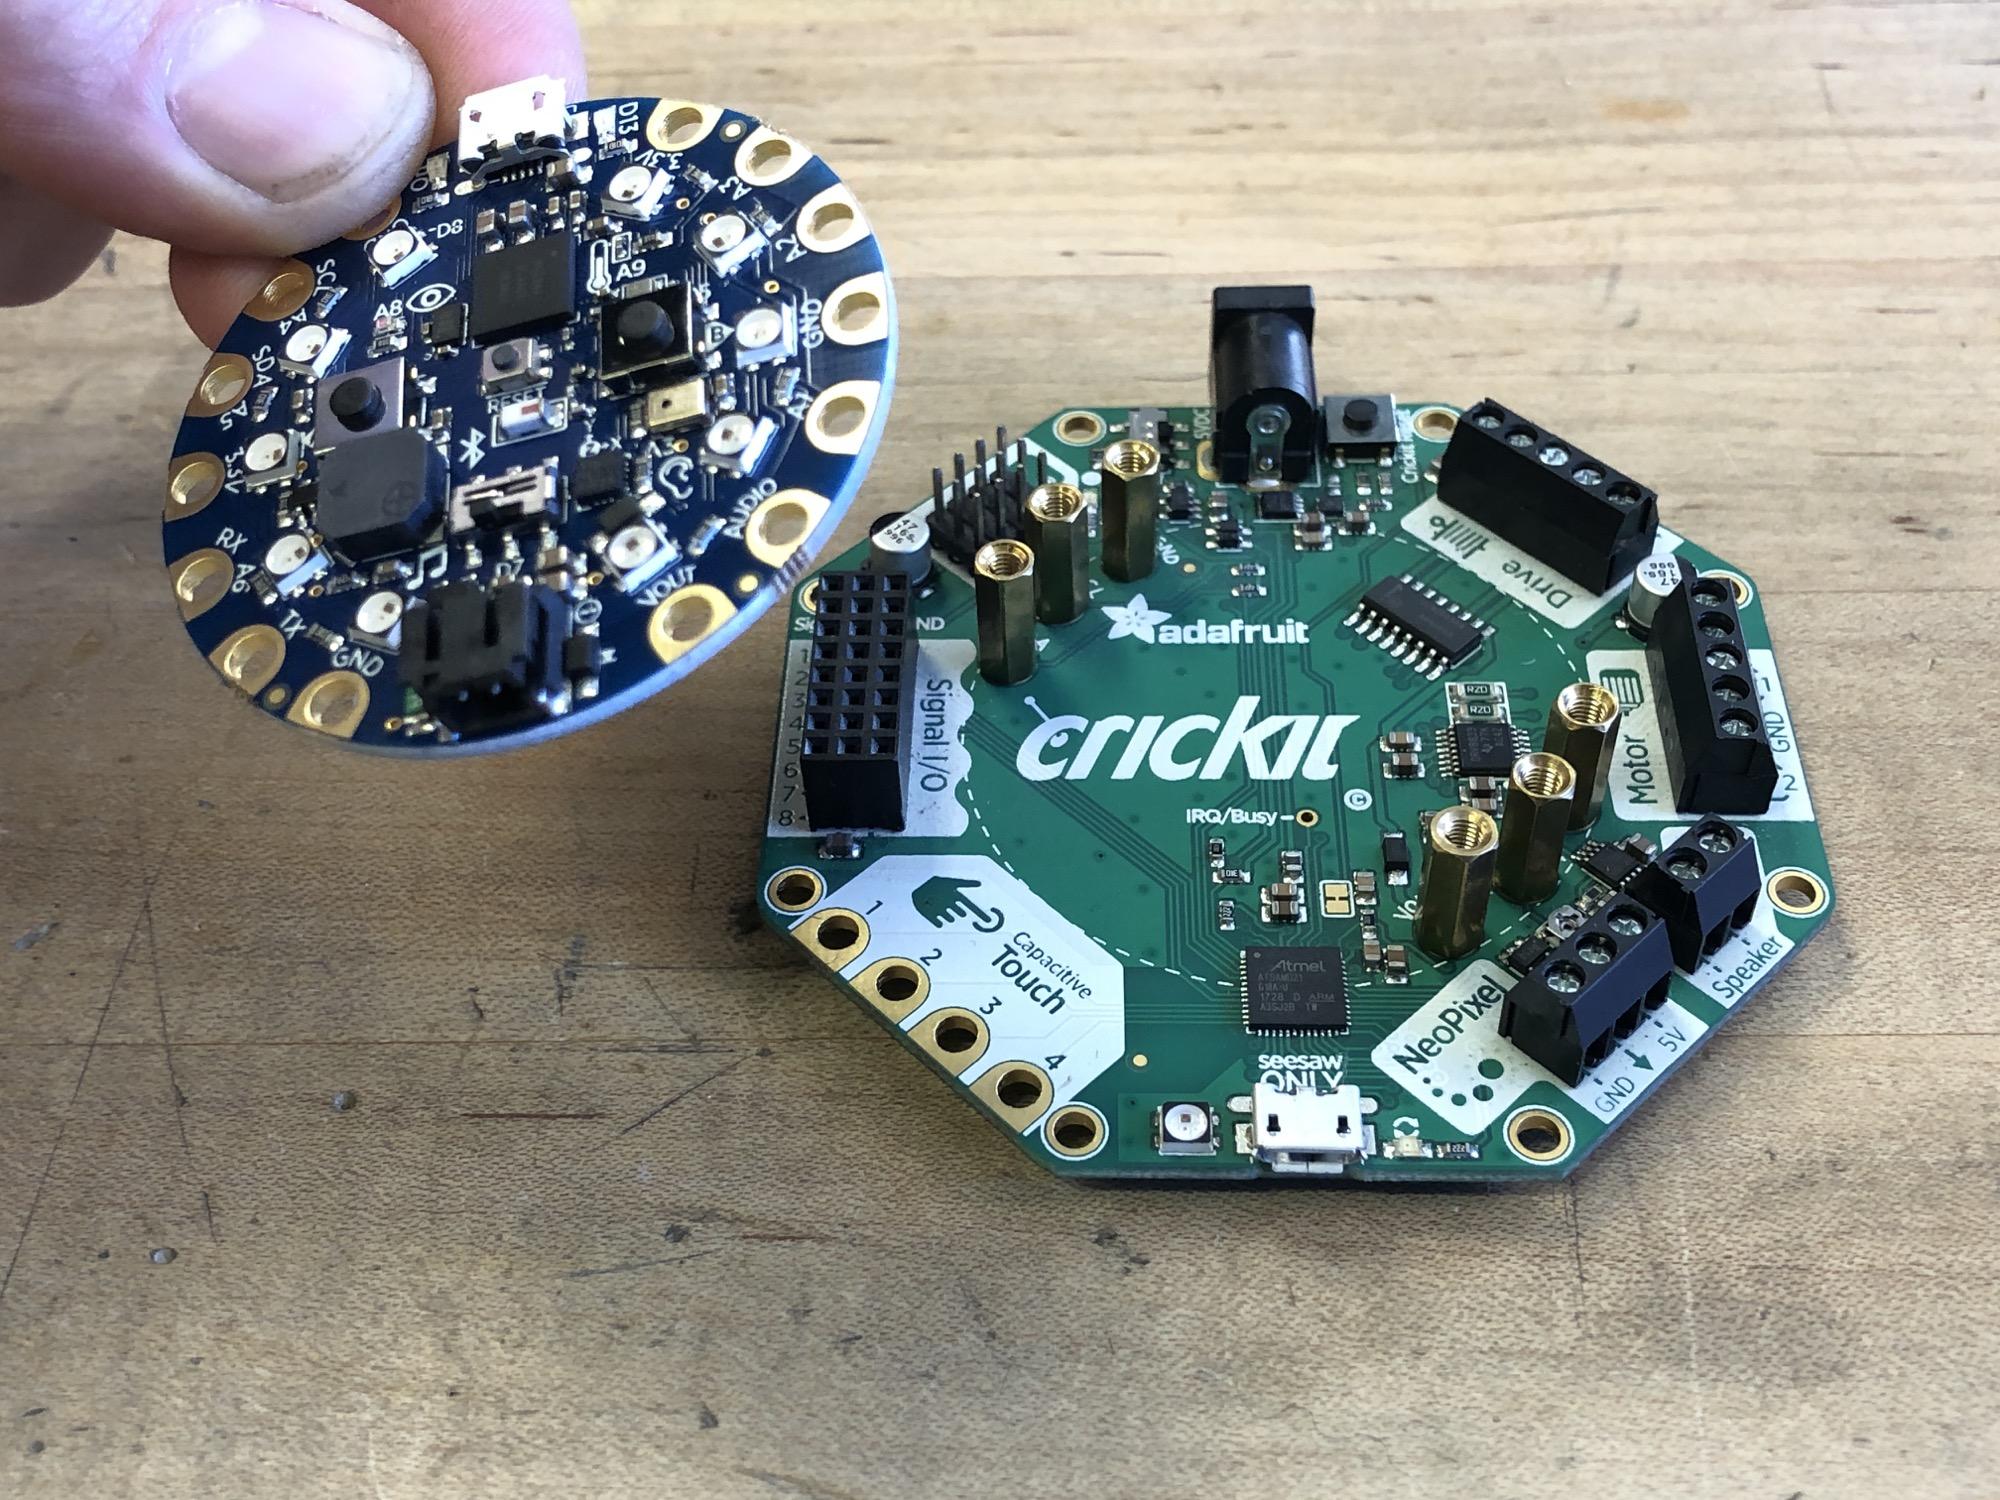 micropython___circuitpython_IMG_9241.jpg